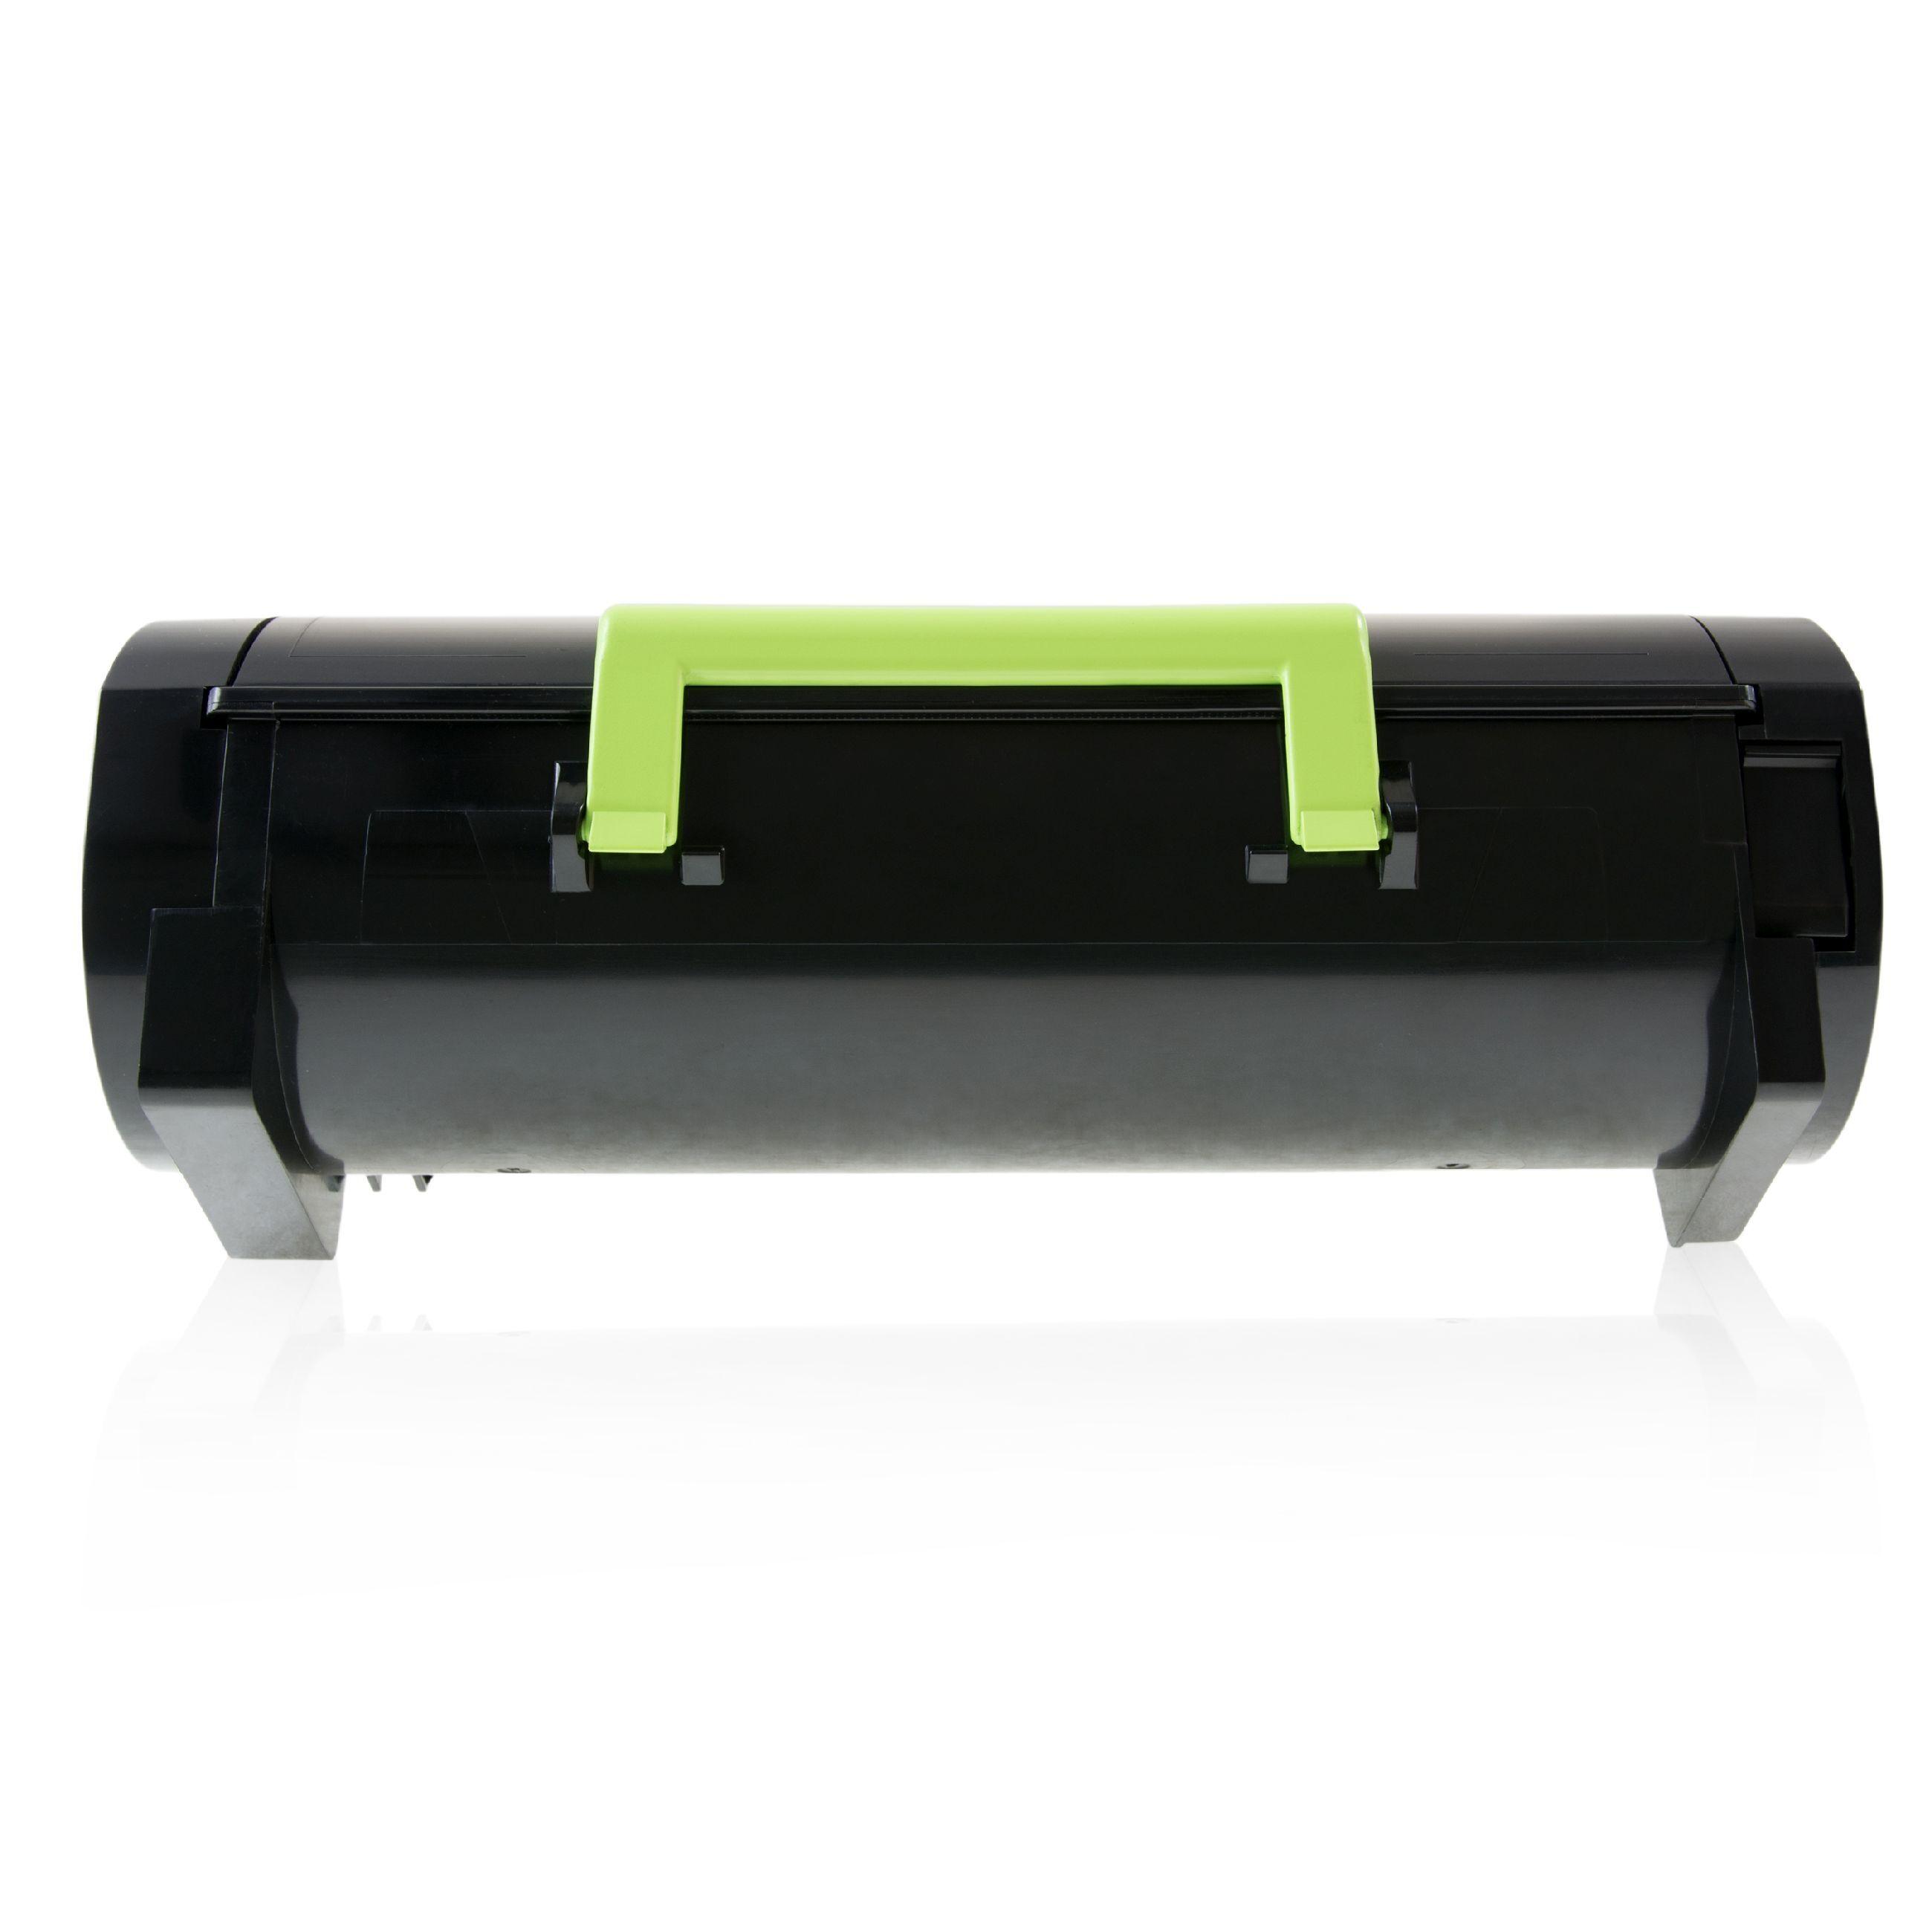 Lexmark Cartouche de Toner pour Lexmark 24B6213 noir compatible (de marque ASC)